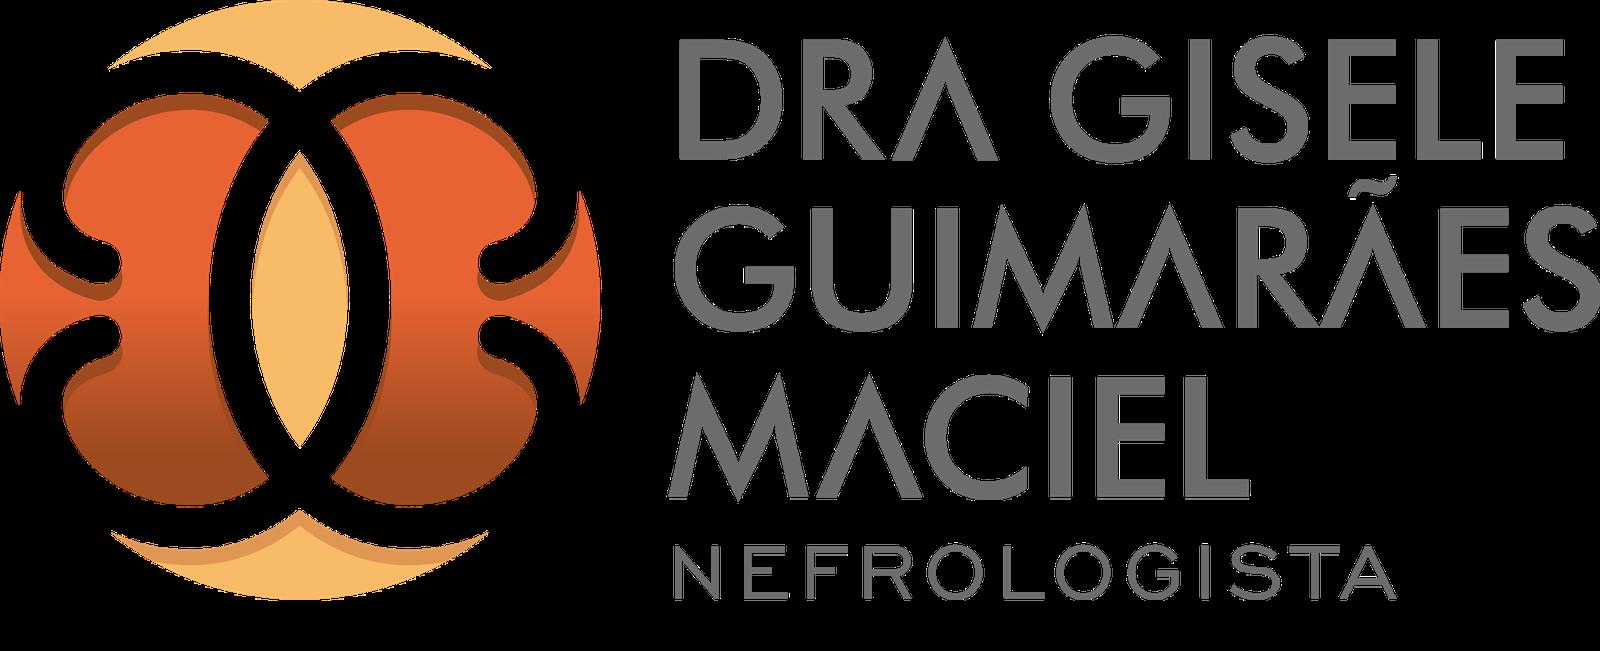 Drª Gisele Guimarães